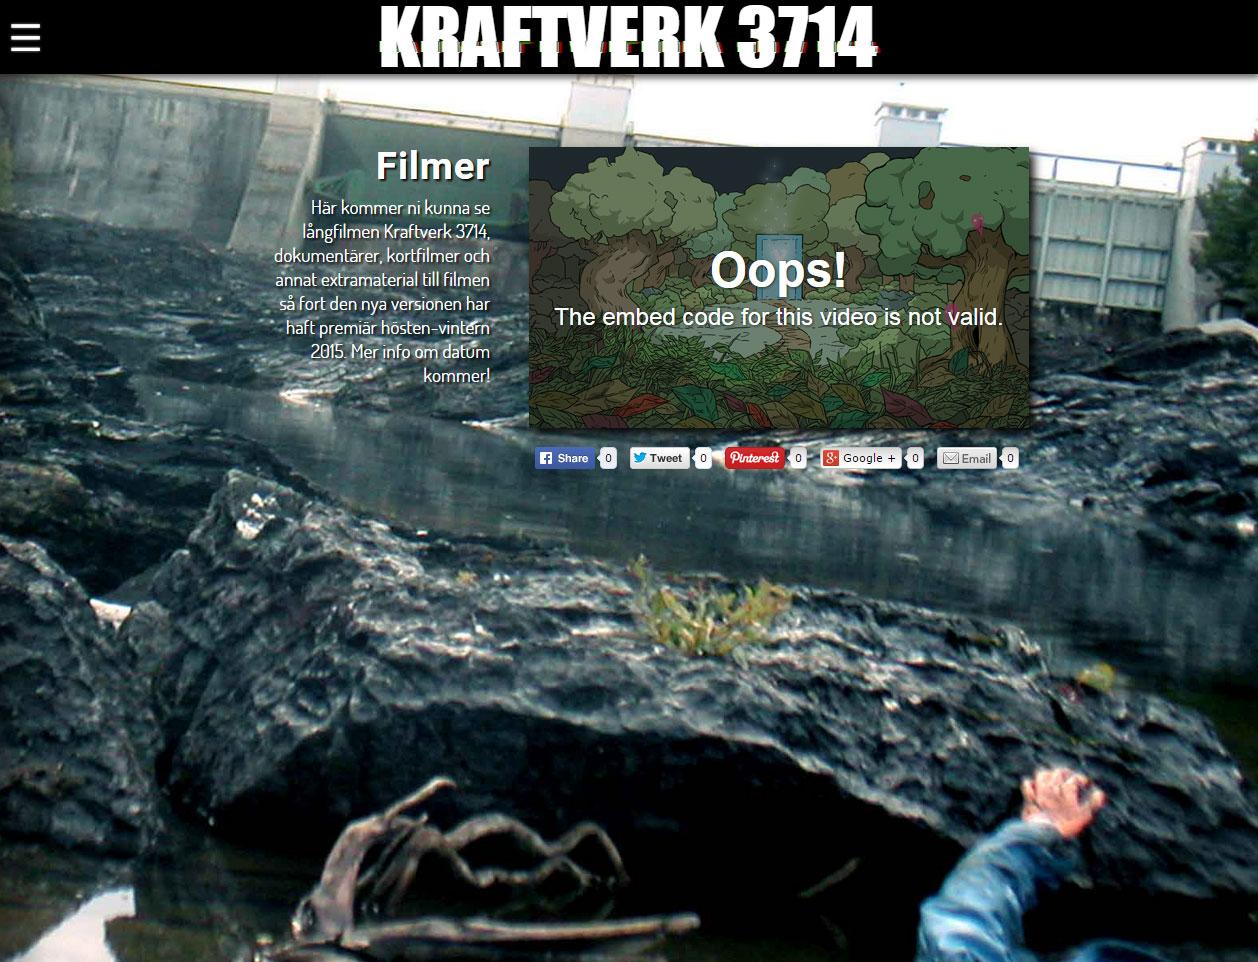 Kraftverk 3714